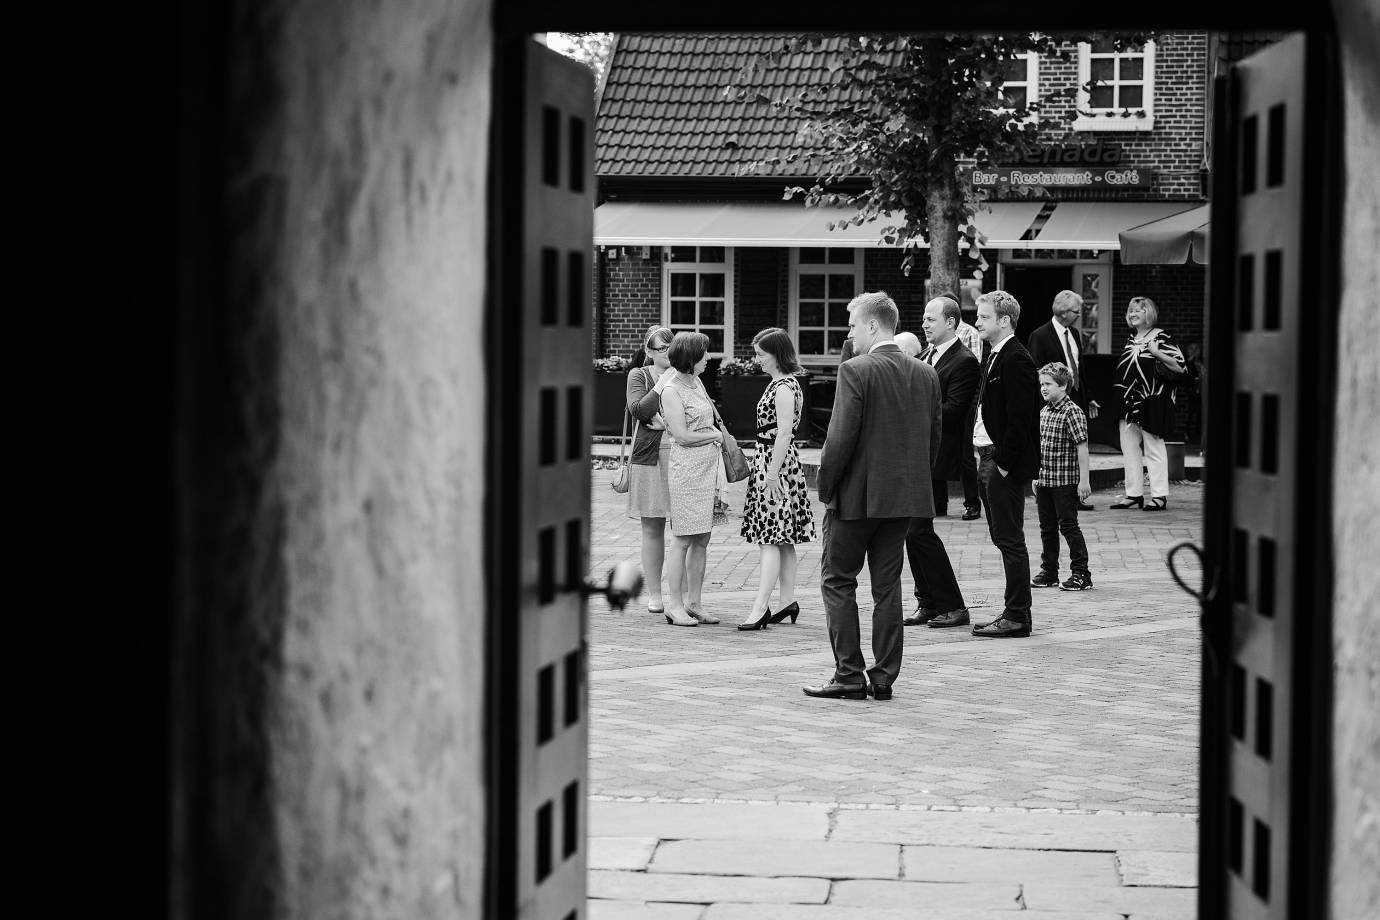 hochzeitsfotograf ohz 031 - Johanna+Sascha